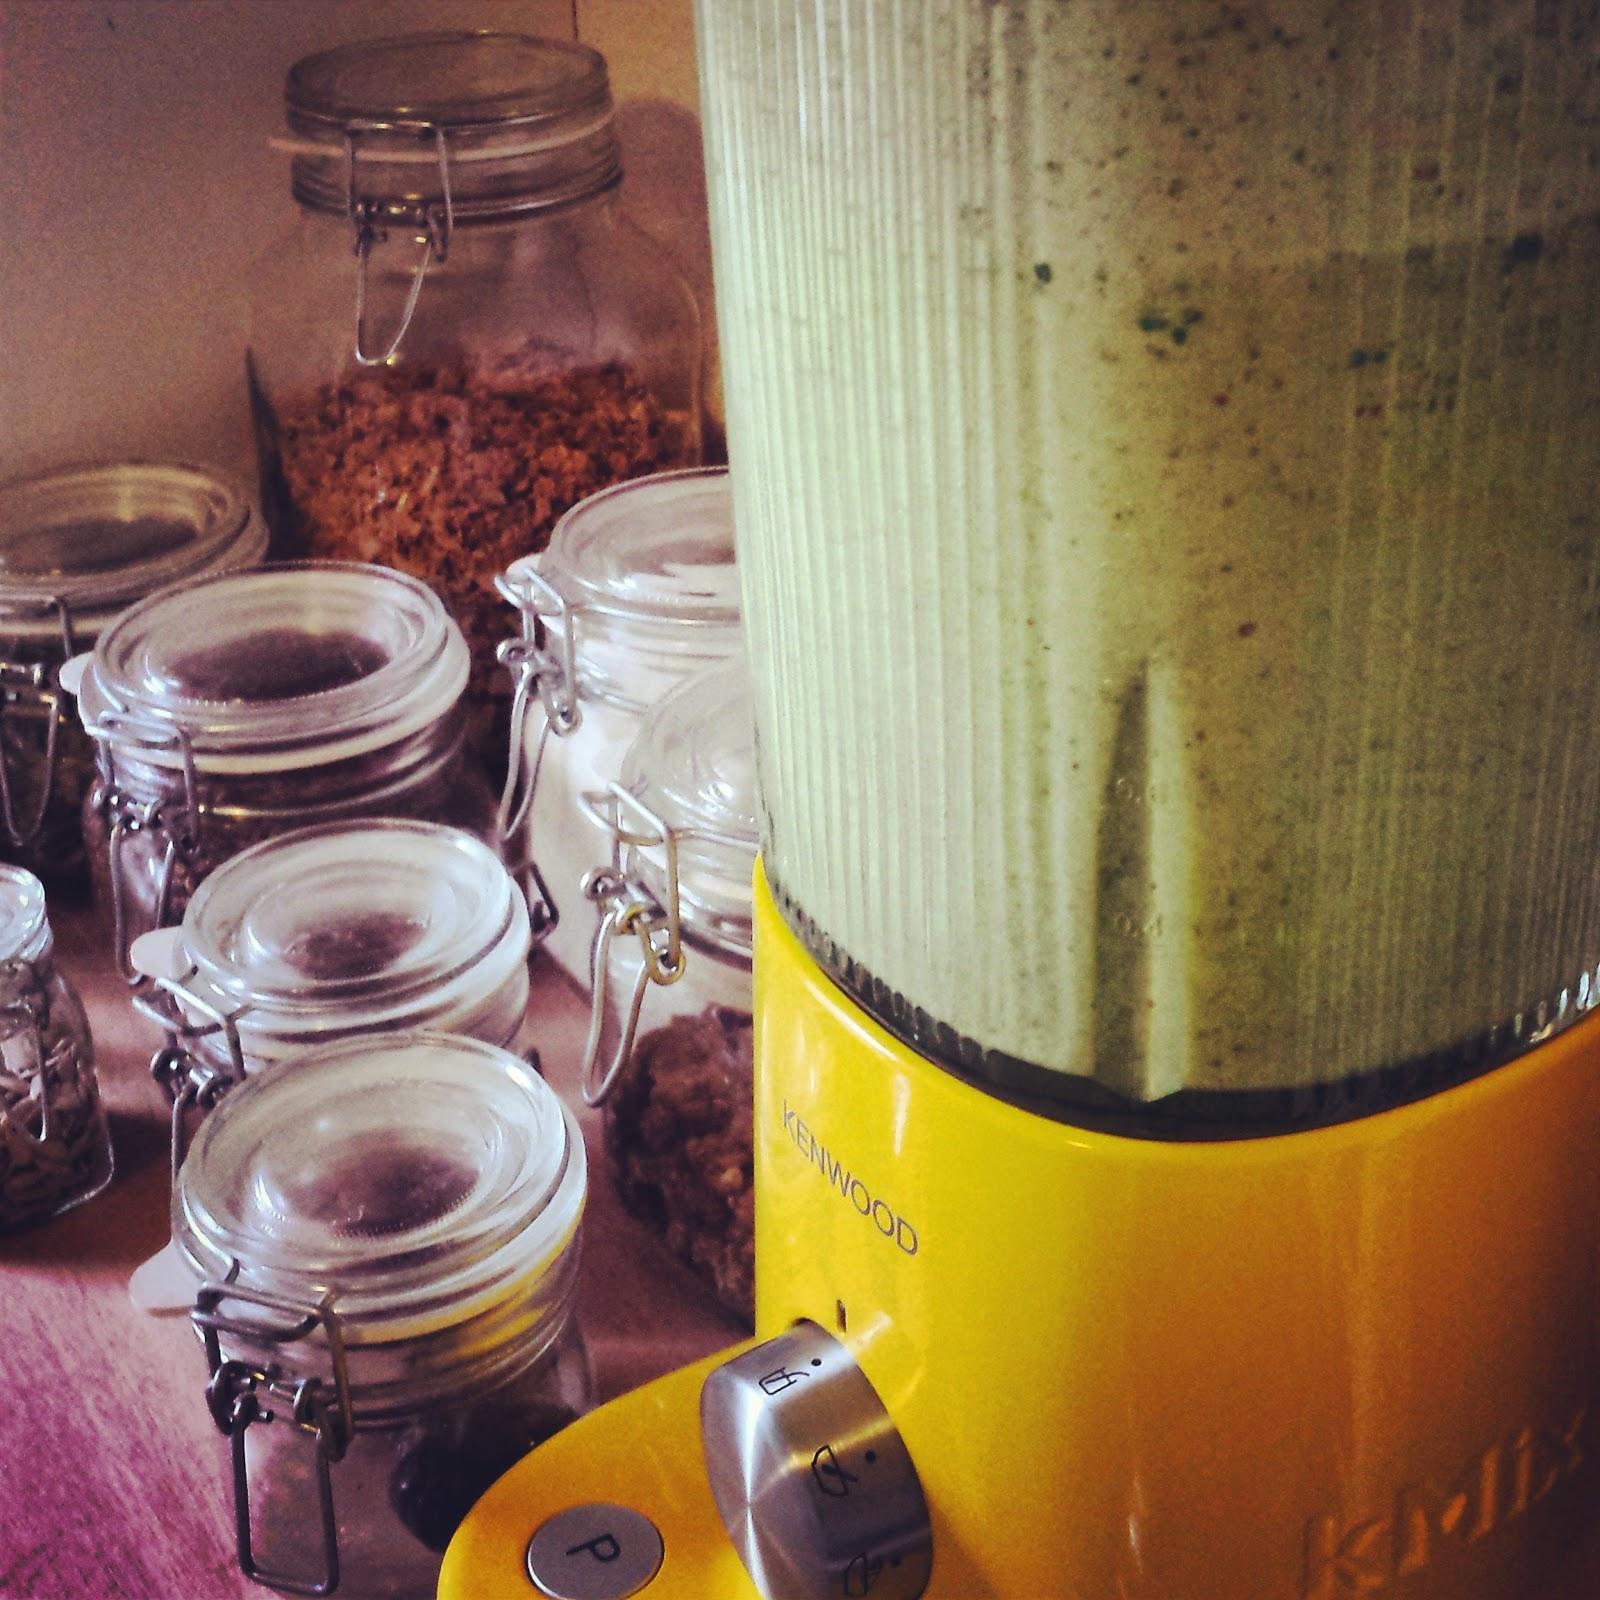 Healthilicious Life - Mijn keuken en groene smoothie